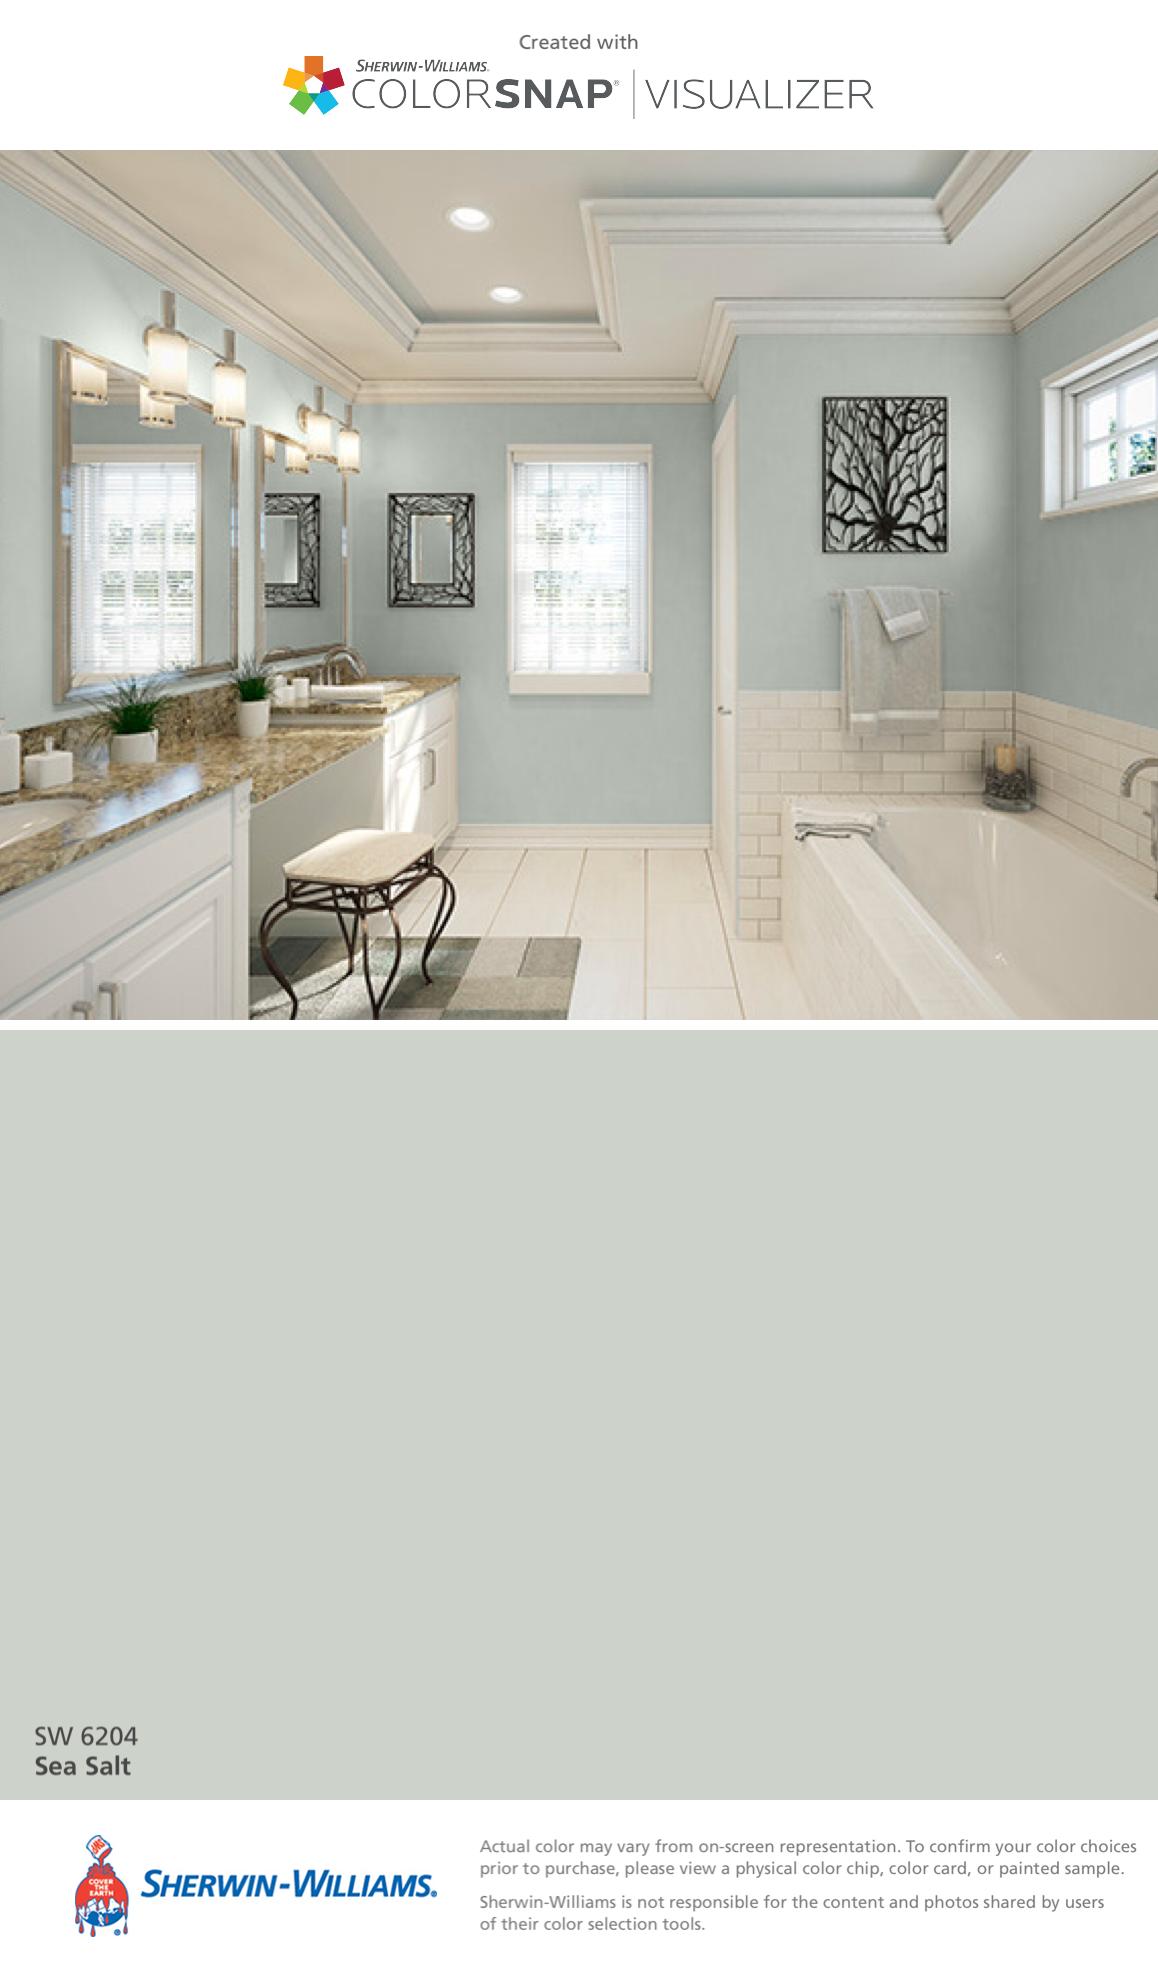 Paint Color Matching App Colorsnap Paint Color App Sherwin Williams Paint Colors For Home Painting Bathroom Matching Paint Colors